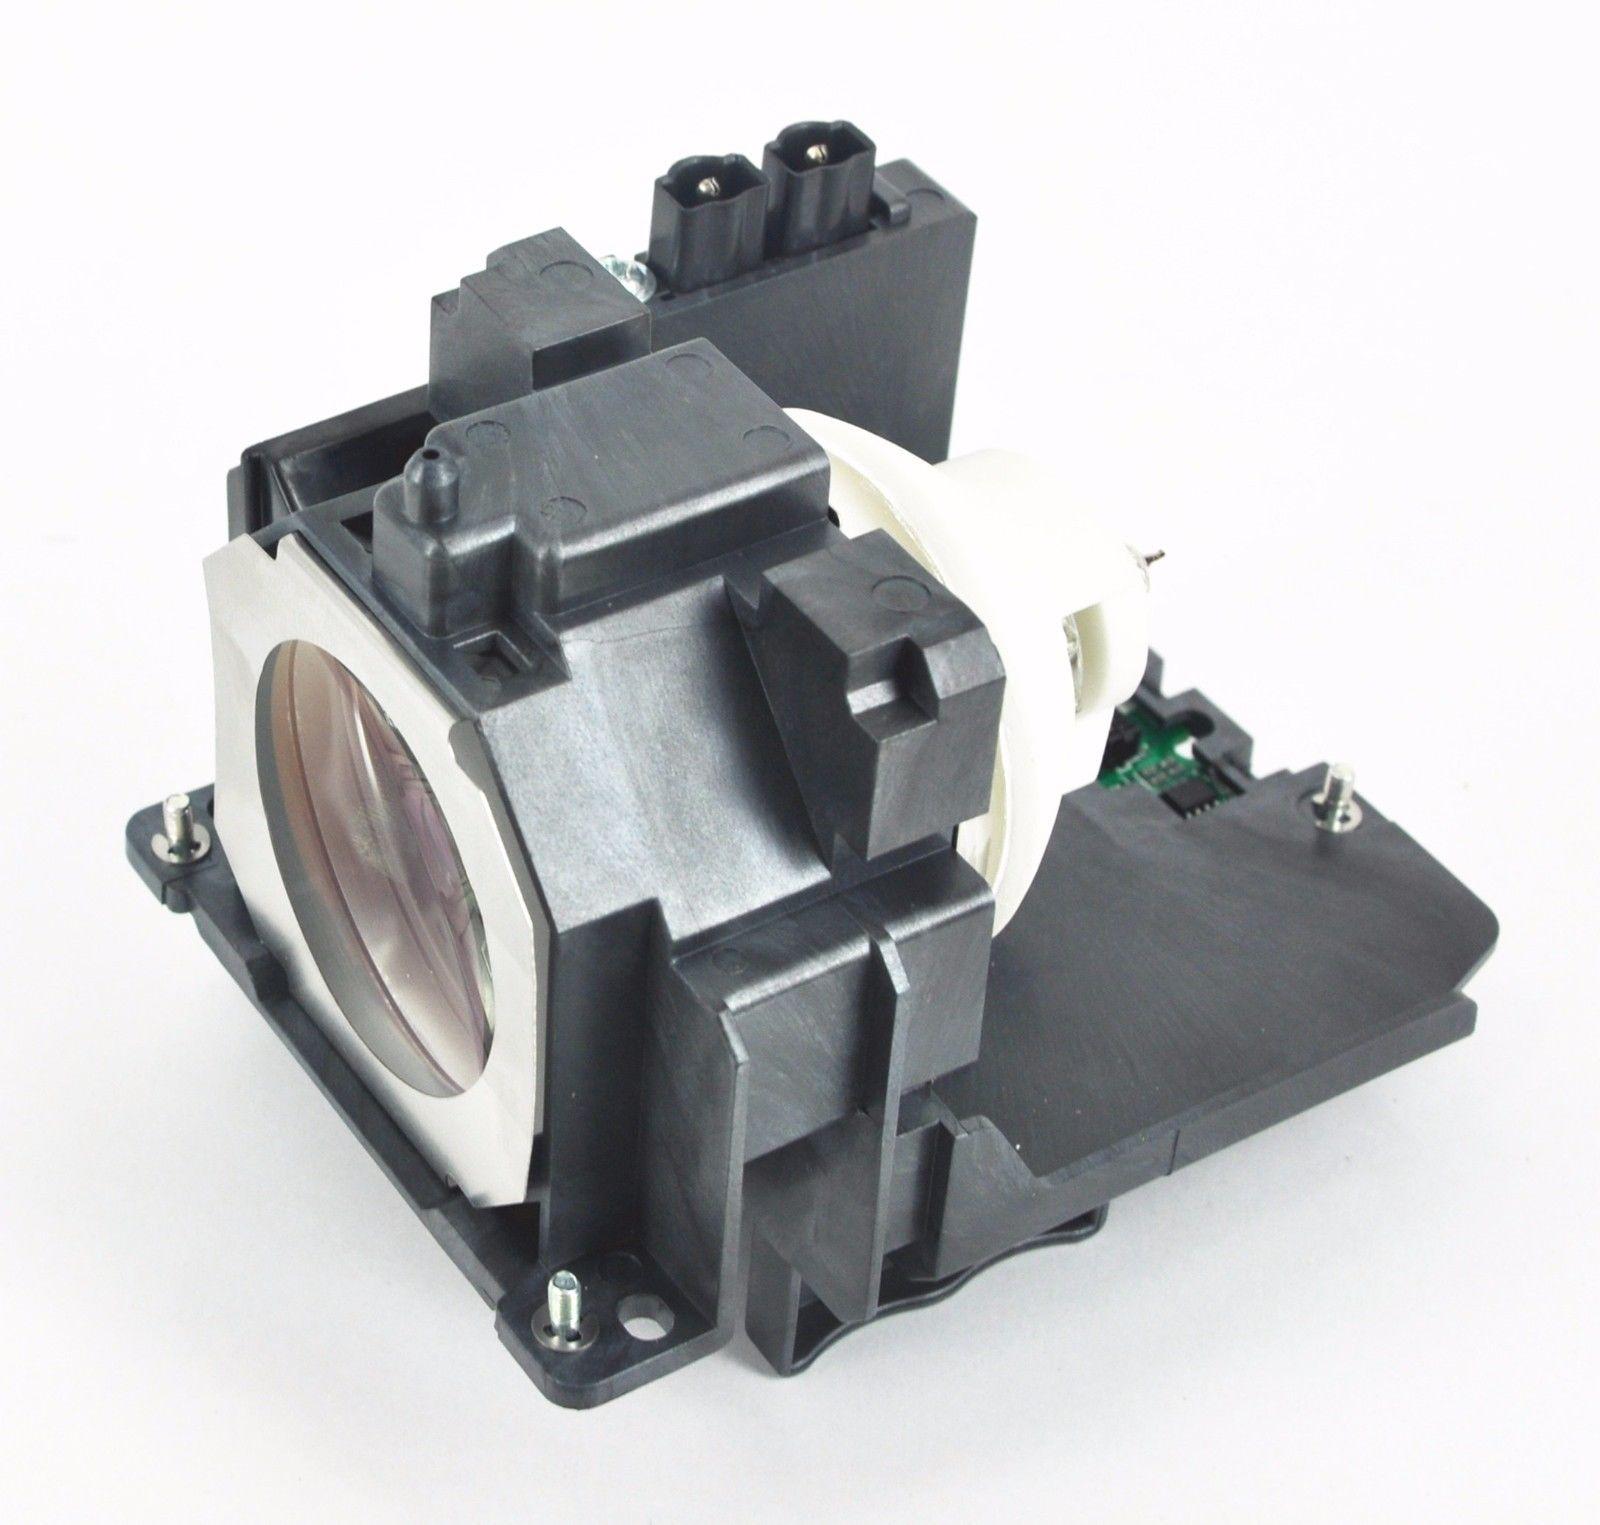 ET-LAE300 ETLAE300 para PANASONIC PT-EX510 PT-EW540 PT-EZ580 PT-EX610 PT-EW640 PT-EW730 PT-EZ770 Lâmpada Do Projetor Lâmpada com Habitação